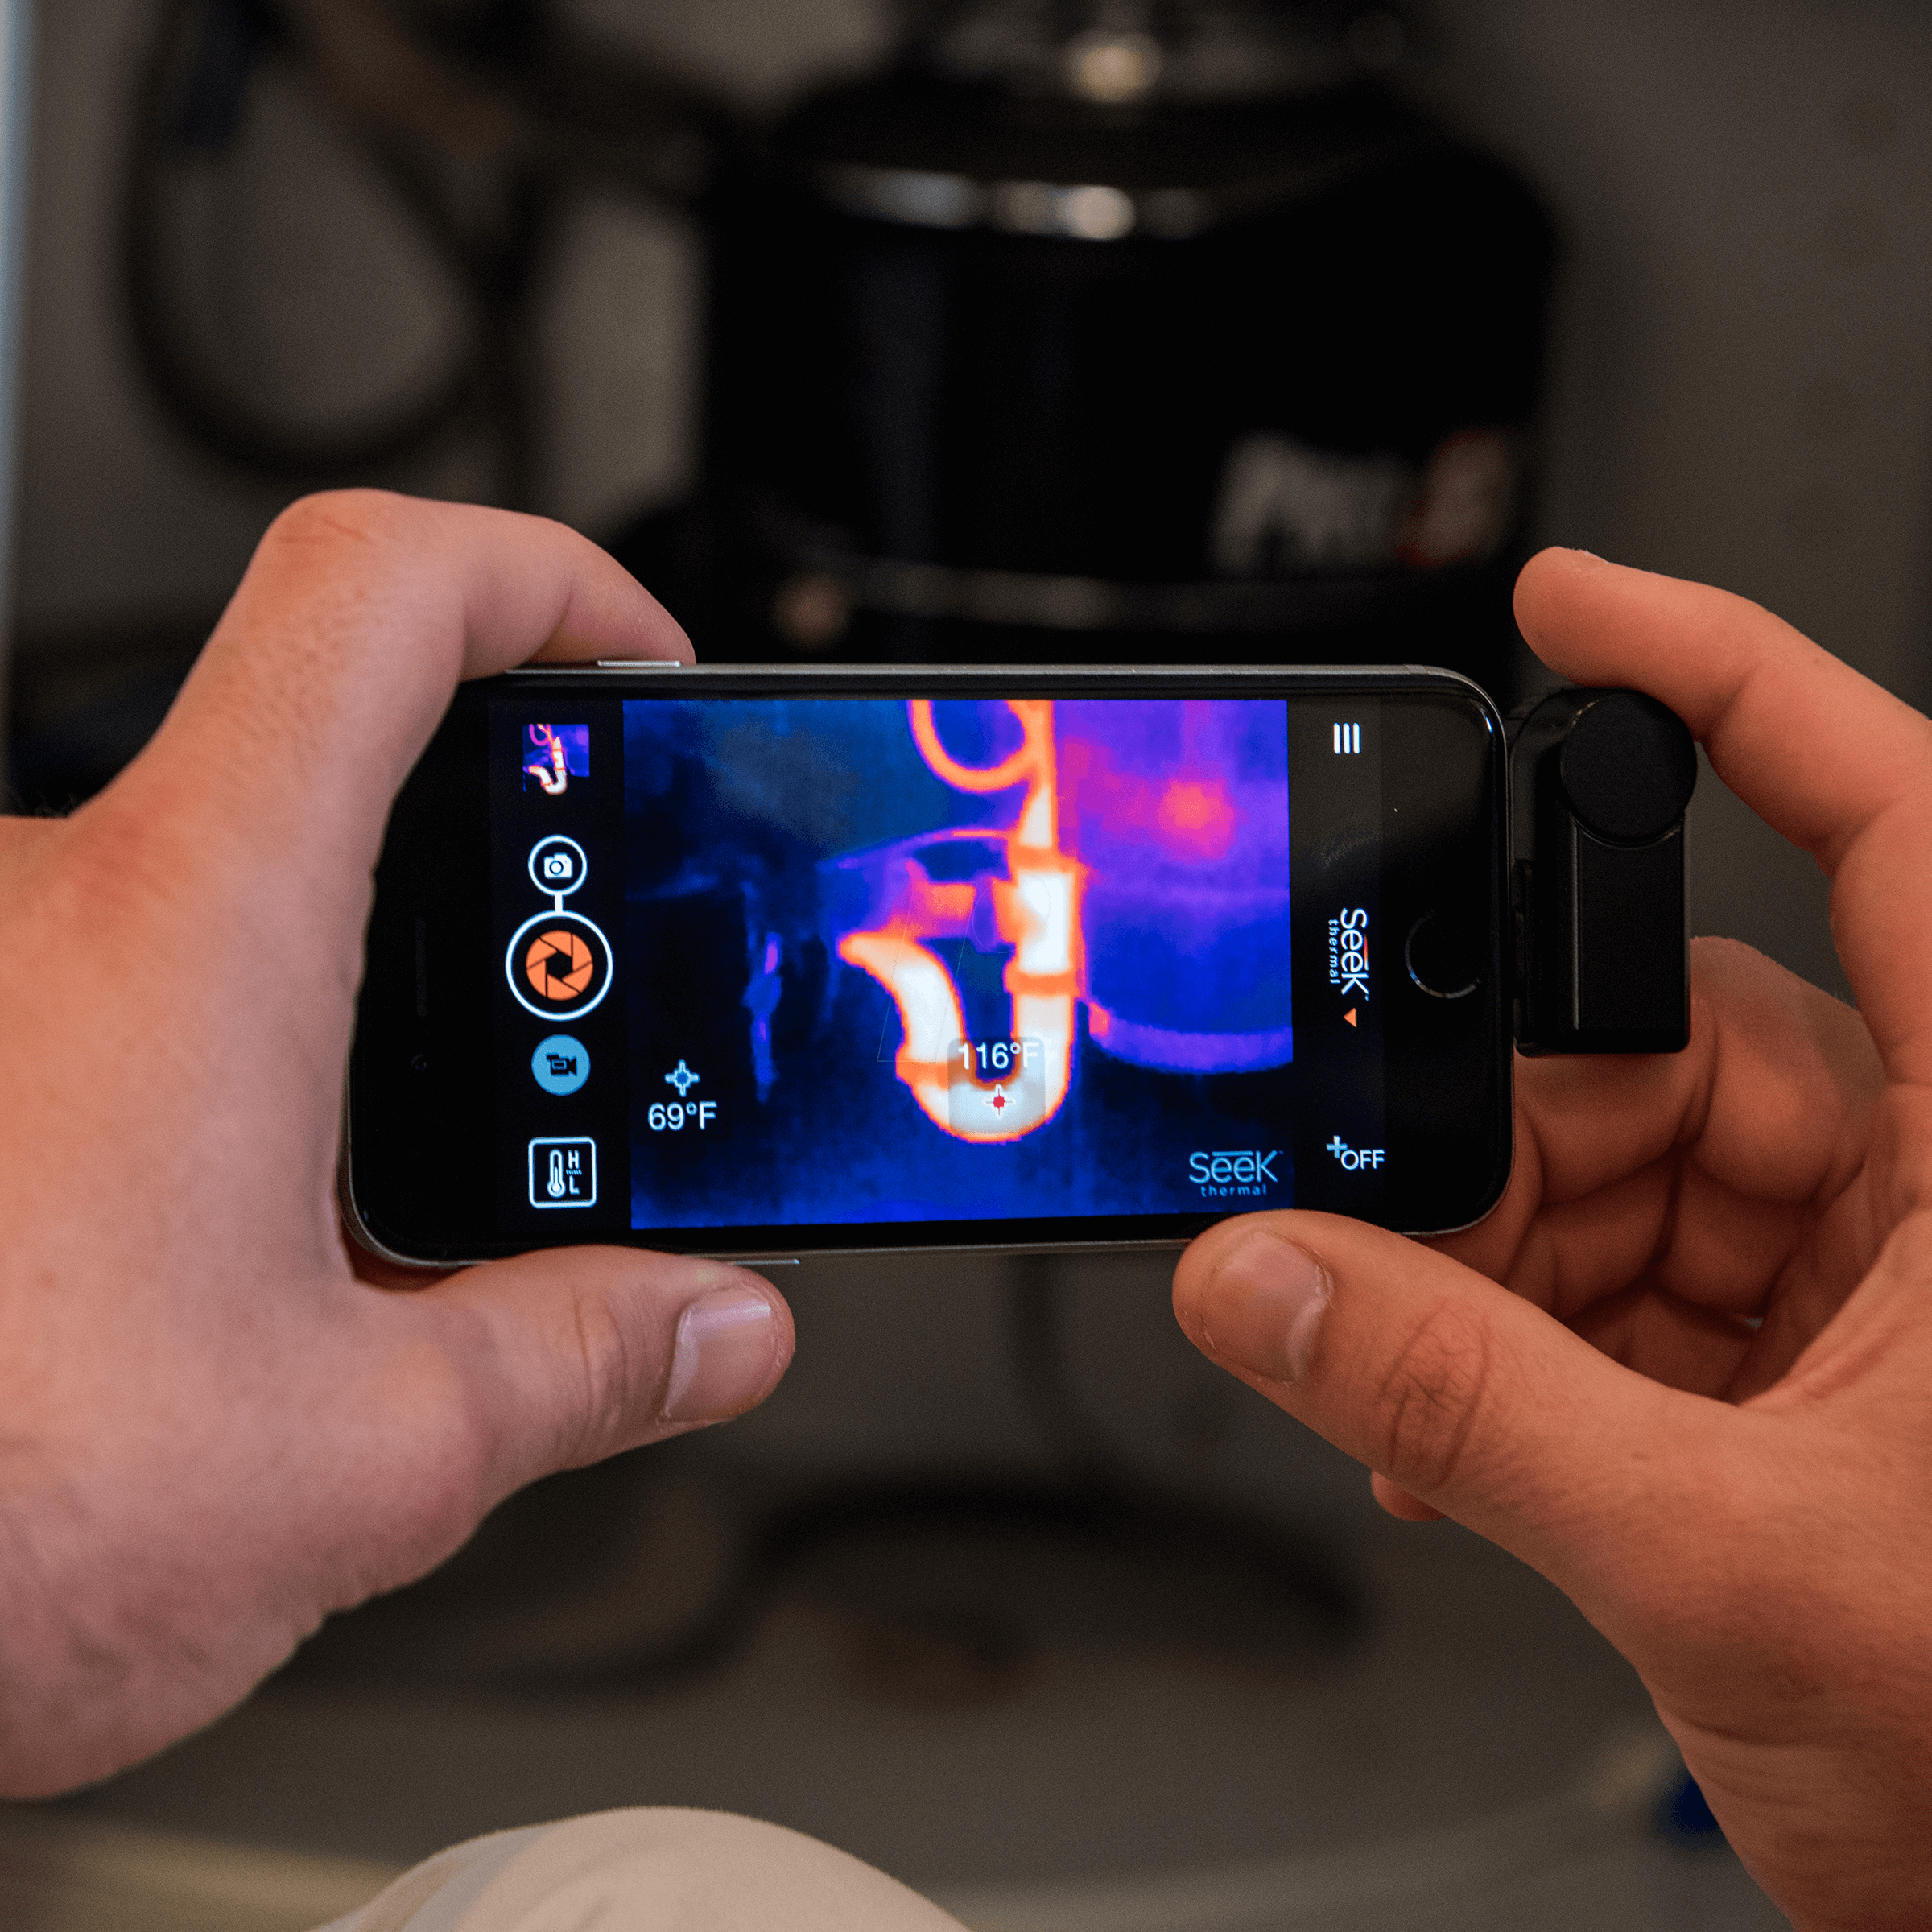 Seek Thermal Camera >> Compact Ios Seek Thermal Imaging Camera For Iphone 40 To 330 C